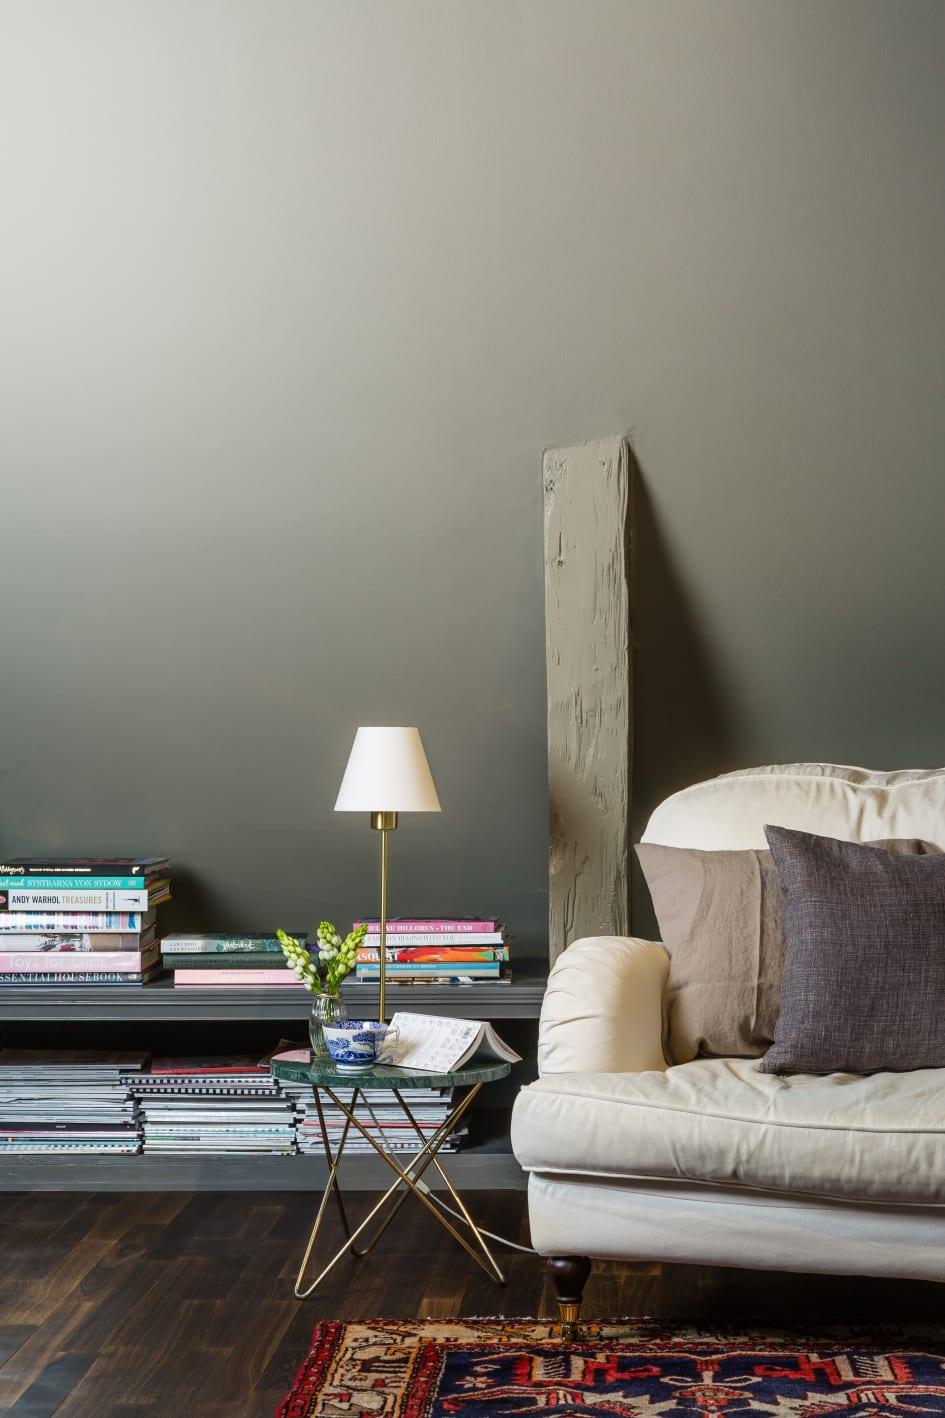 pris nordsjö väggfärg